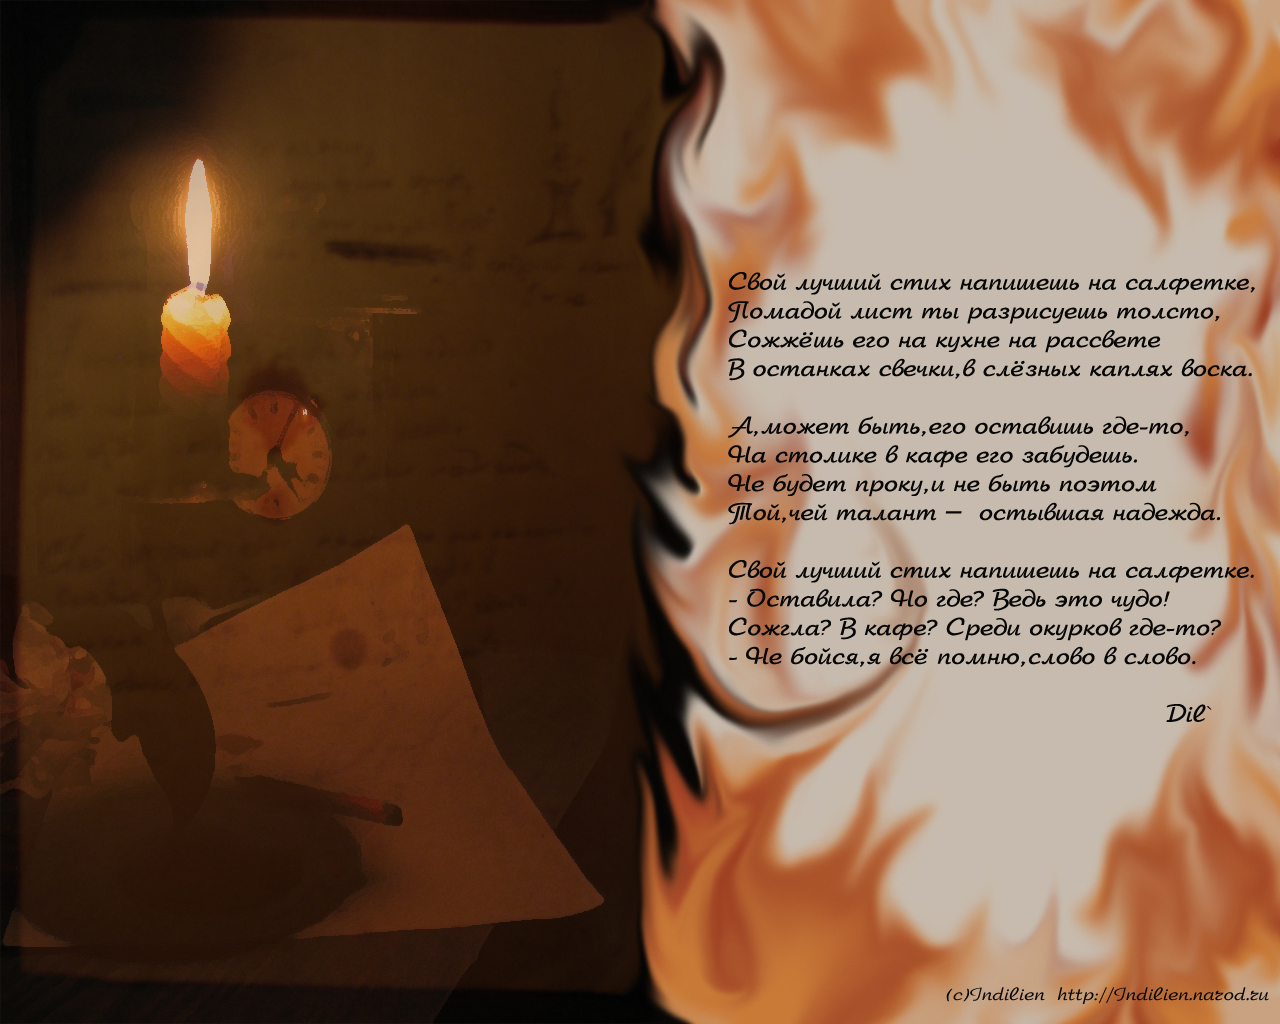 Стихи написаны своими руками 282